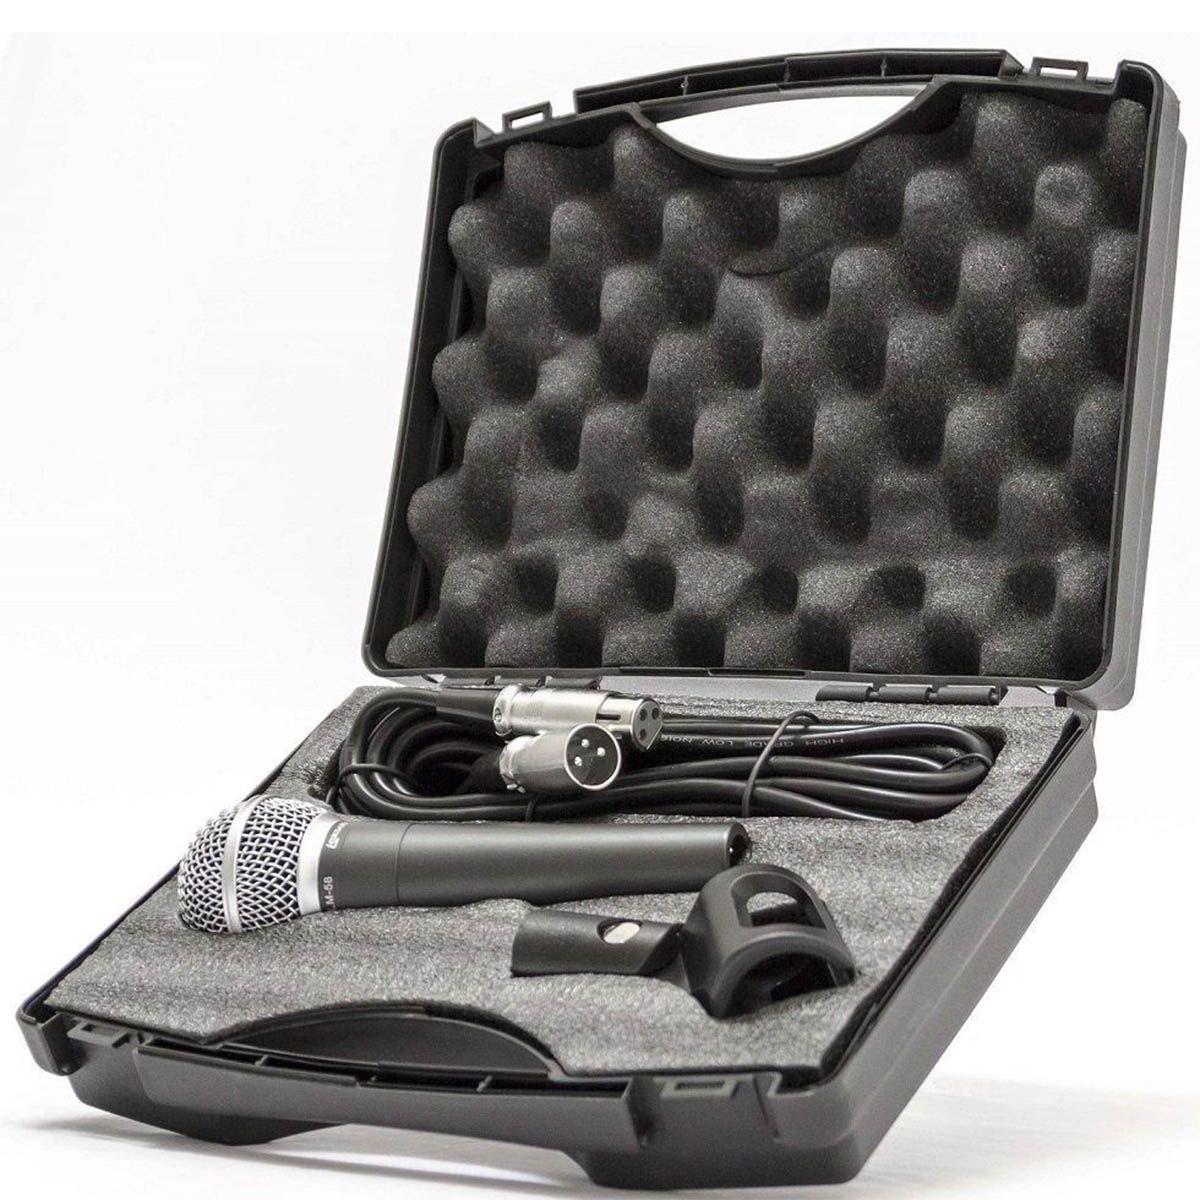 Microfone Profissional Lexsen LM58 com Estojo